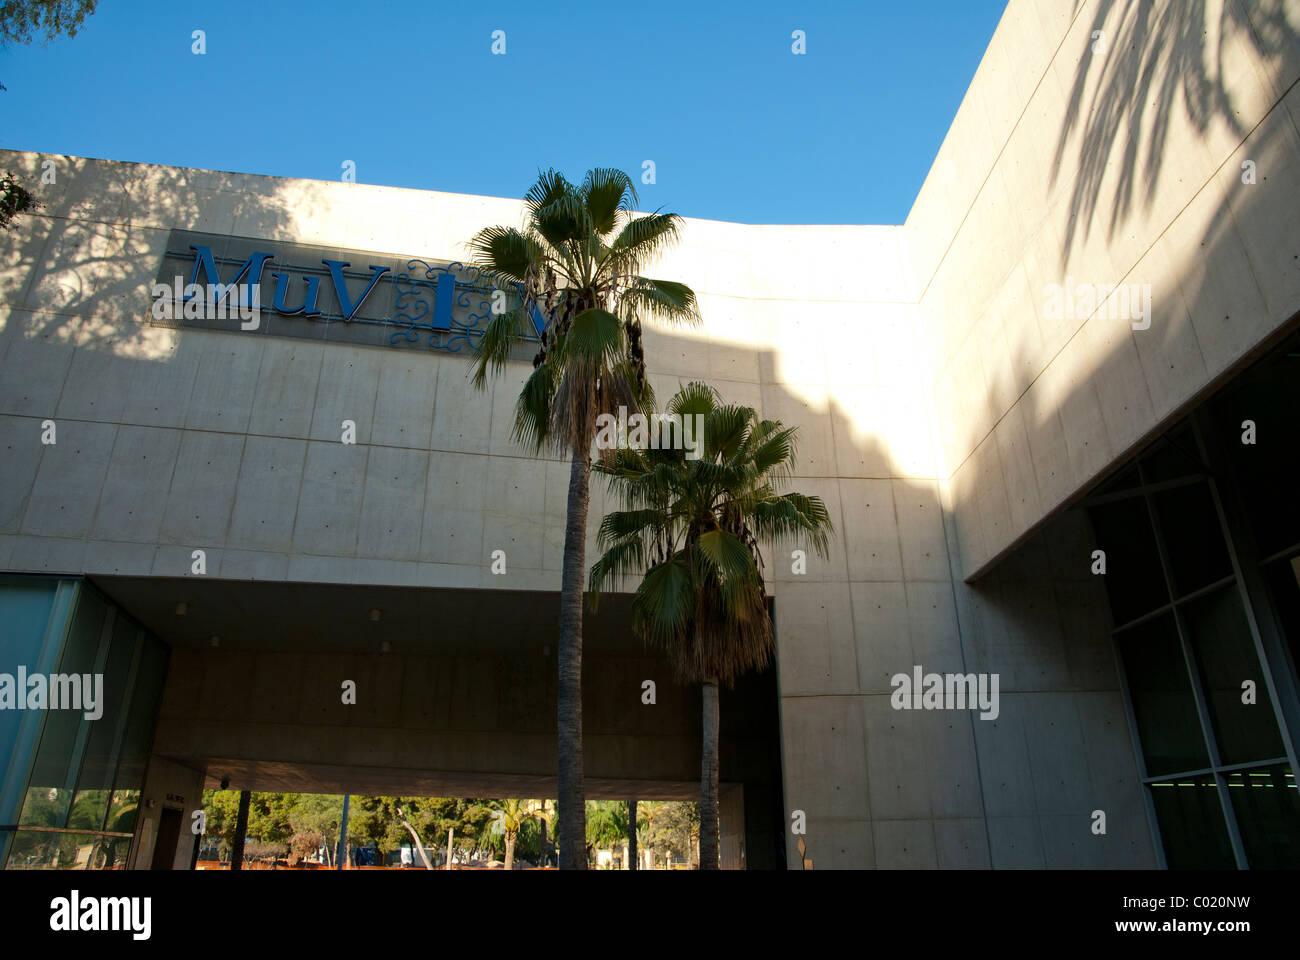 Valencian Museum of Illustration and Modernity – MUVIM Valencia, Spain - Stock Image